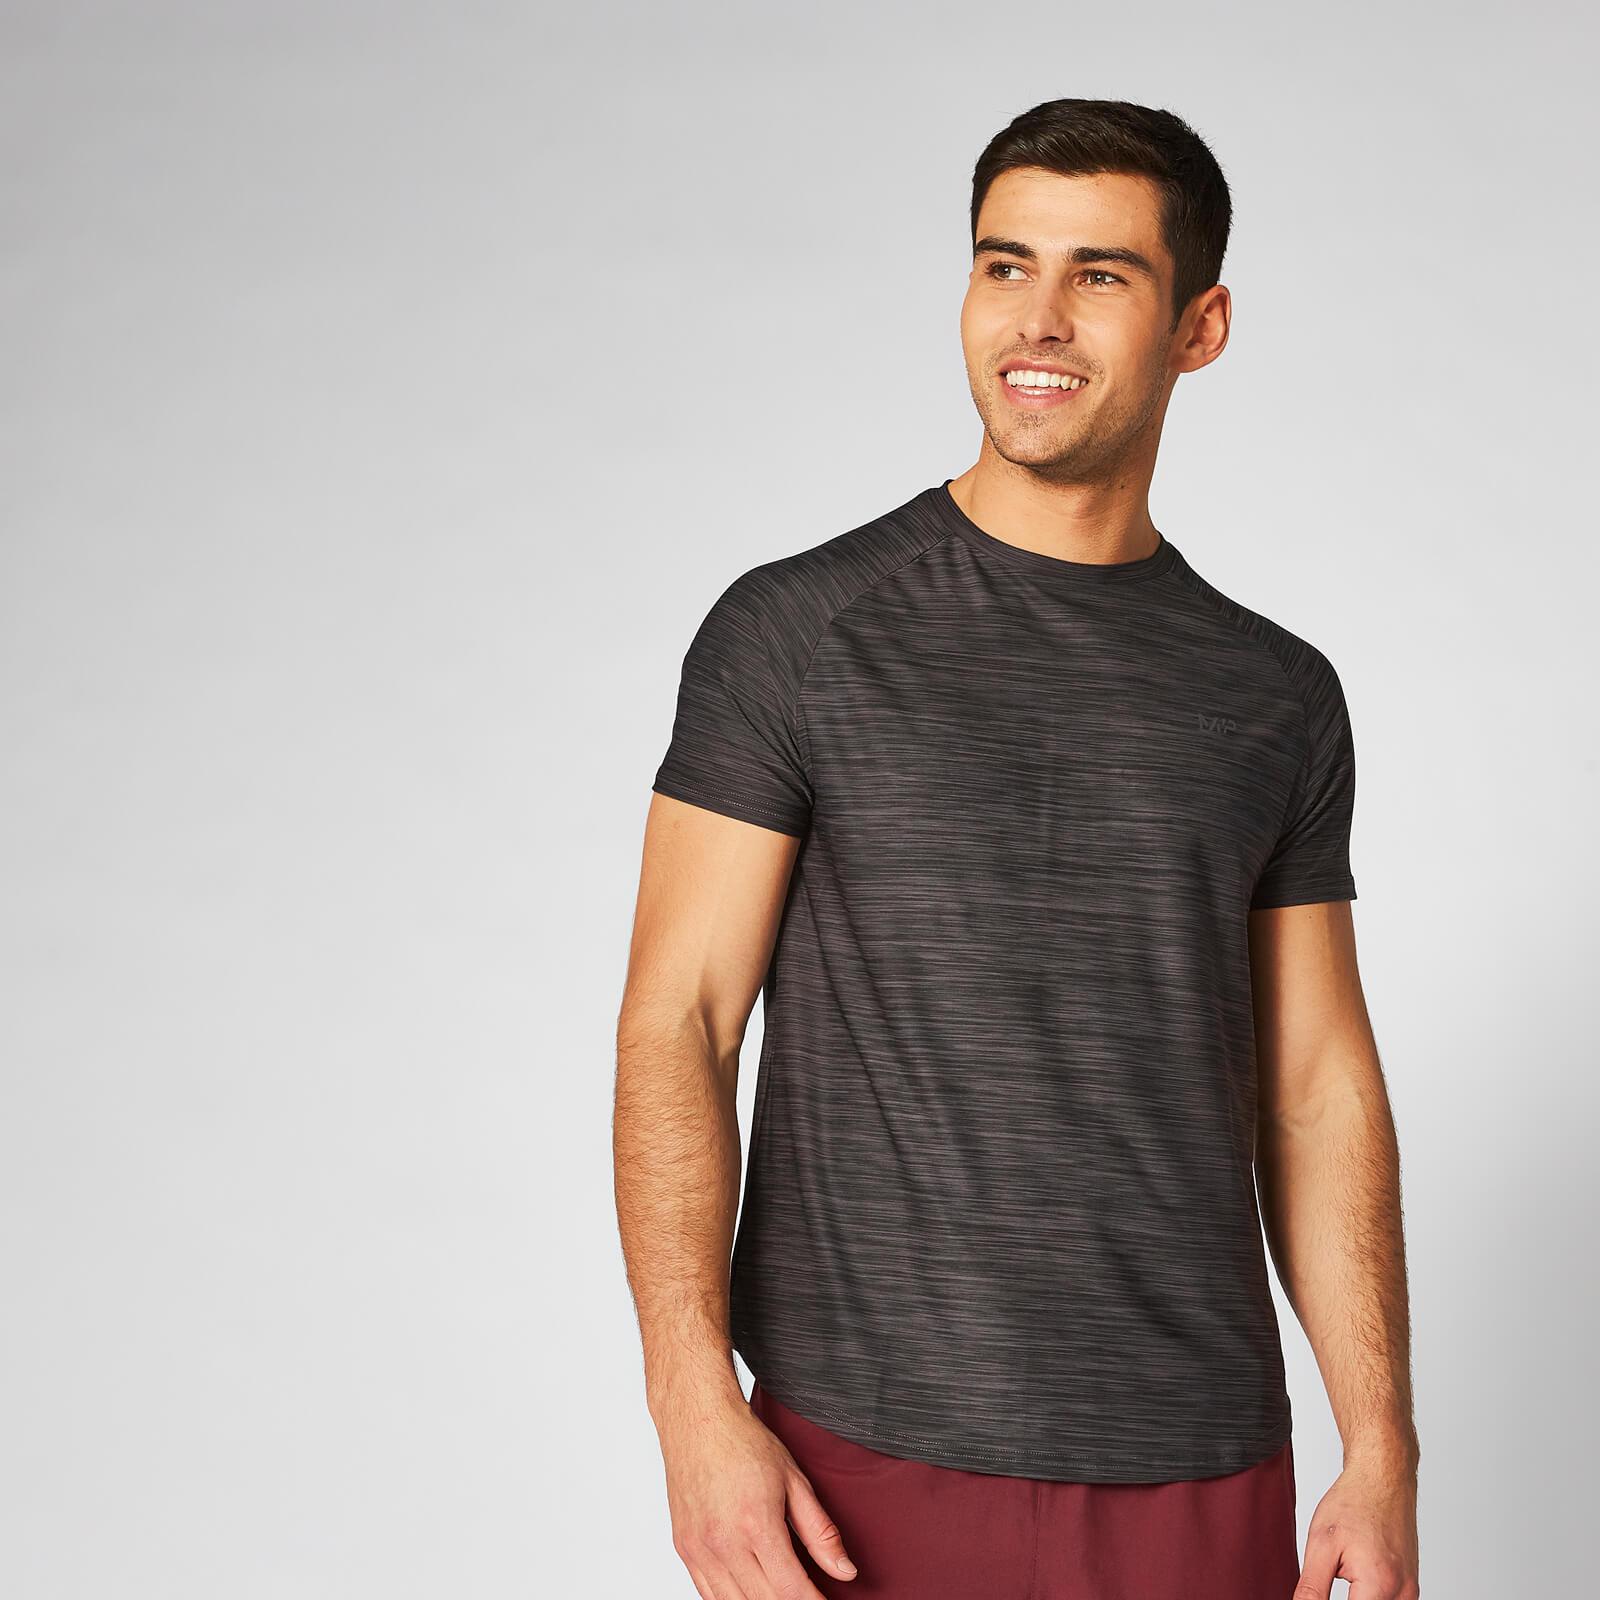 b7c77c1c6 Dry-Tech Infinity T-Shirt - Slate Marl